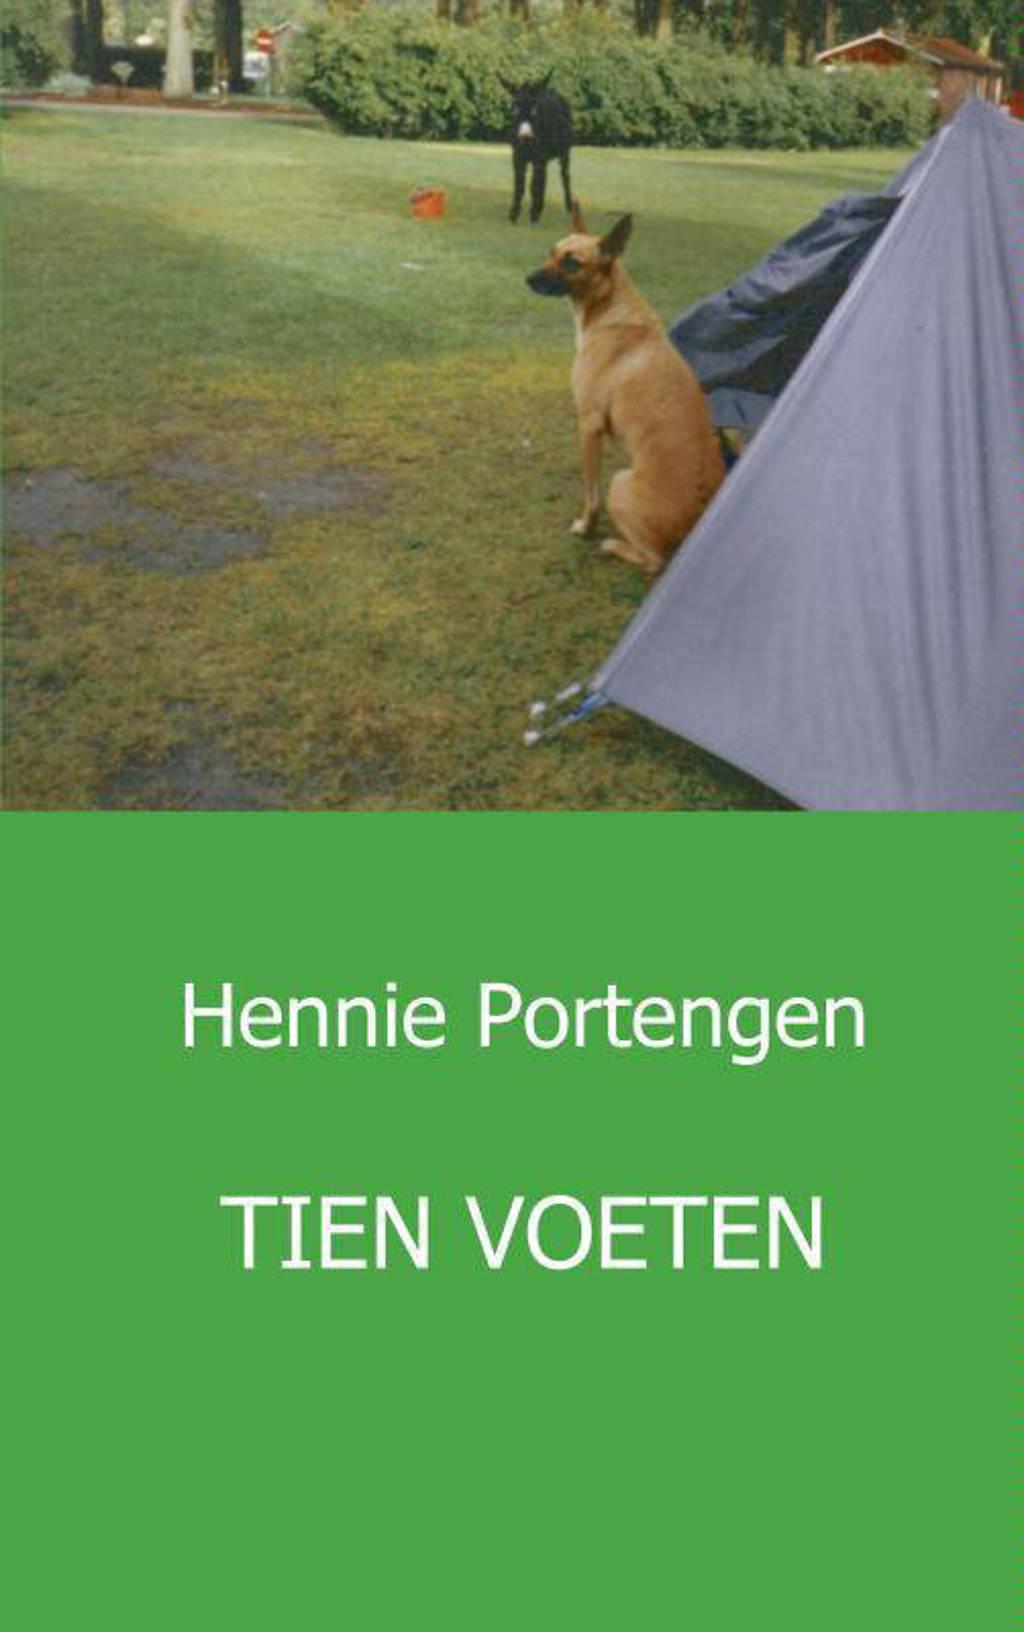 Tien voeten - Hennie Portengen